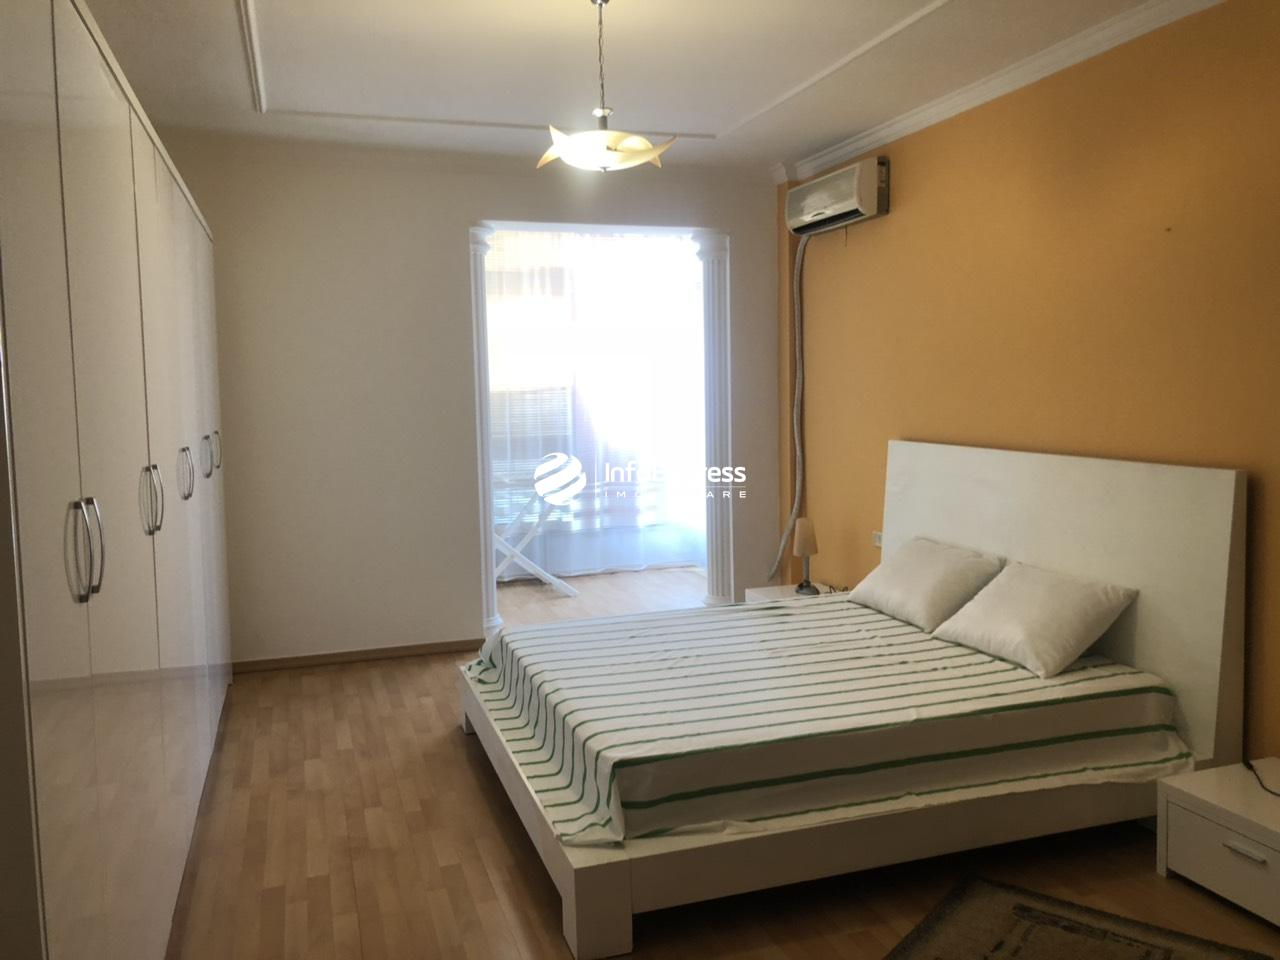 TRR-0419-1458  Jepet me qera apartament 3+1 ndodhet prane juveniljes,venecias ,lion park.